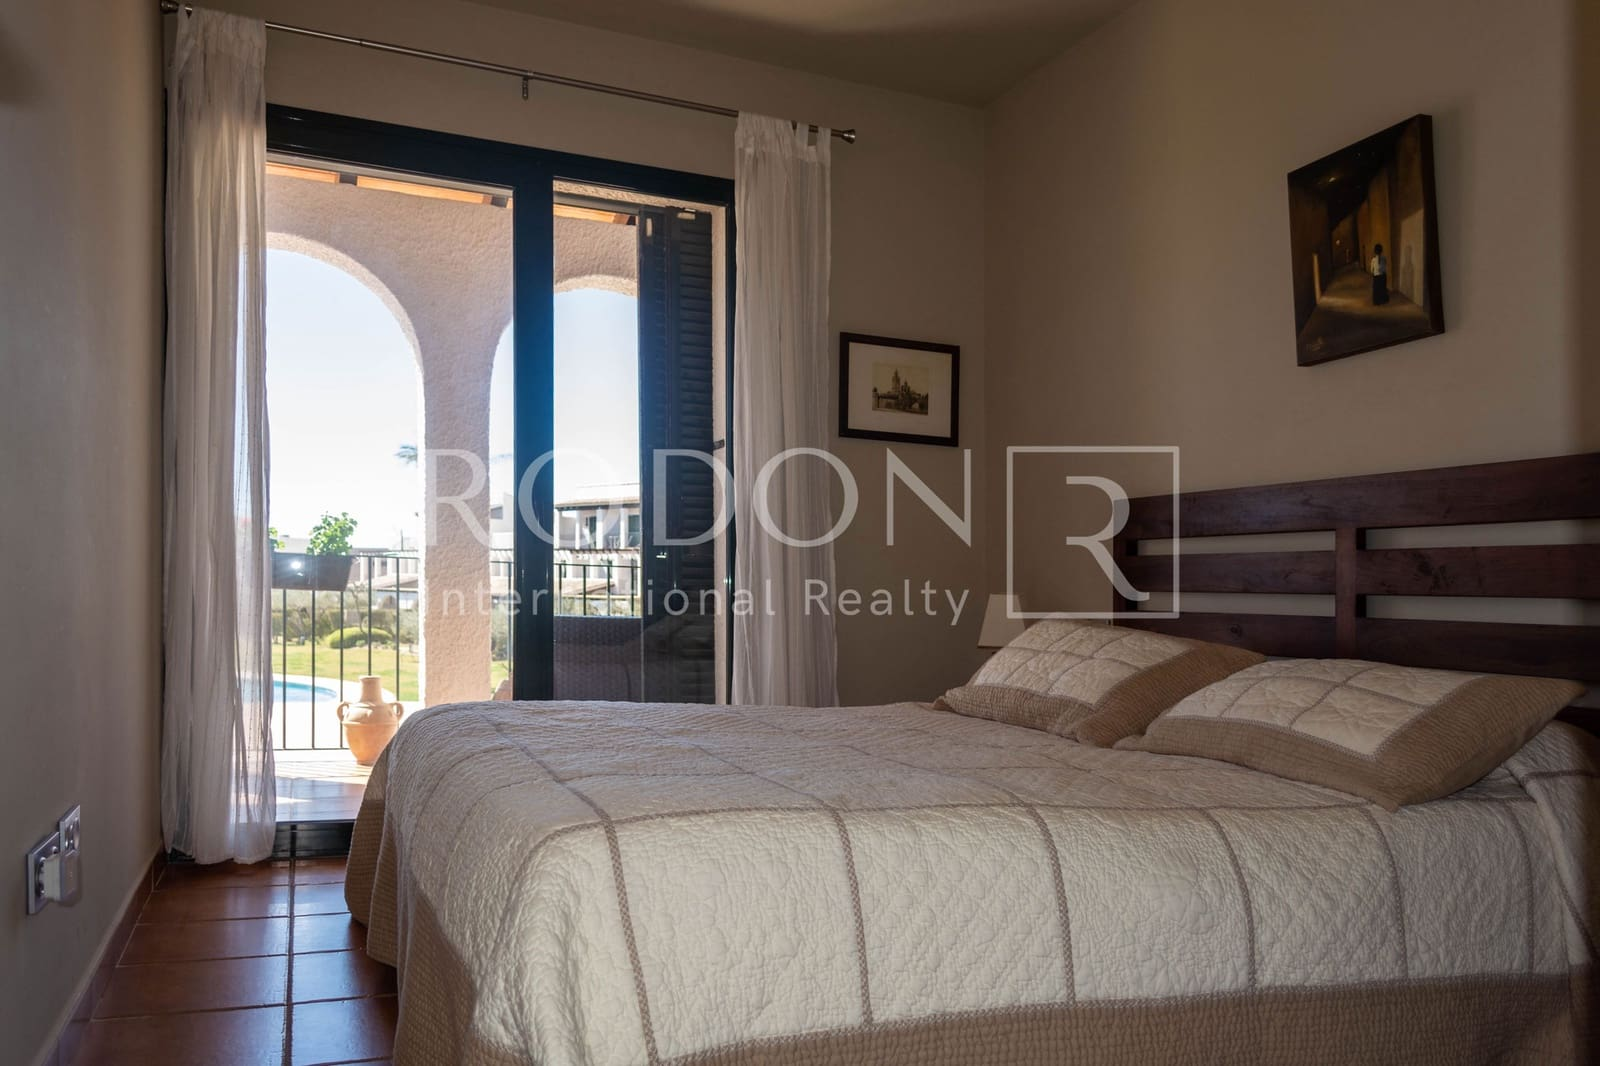 3 bedroom Townhouse for sale in El Perello - € 265,000 (Ref: 5992889)